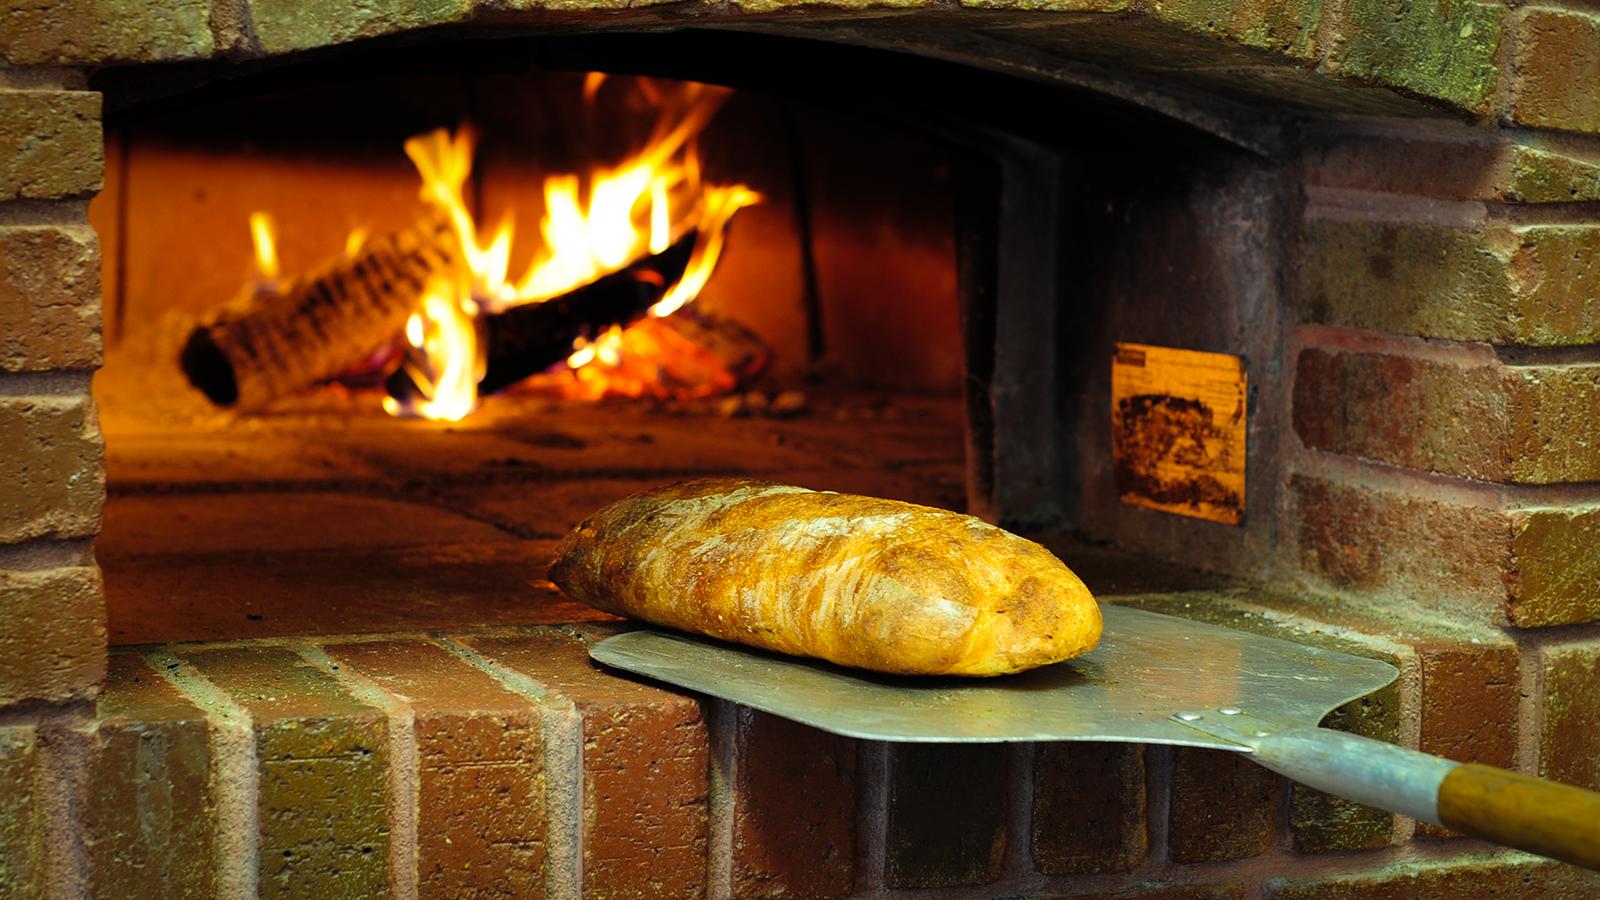 Mulino Italian Kitchen and Bar - Italian Restaurant in Raleigh - Fresh baked bread